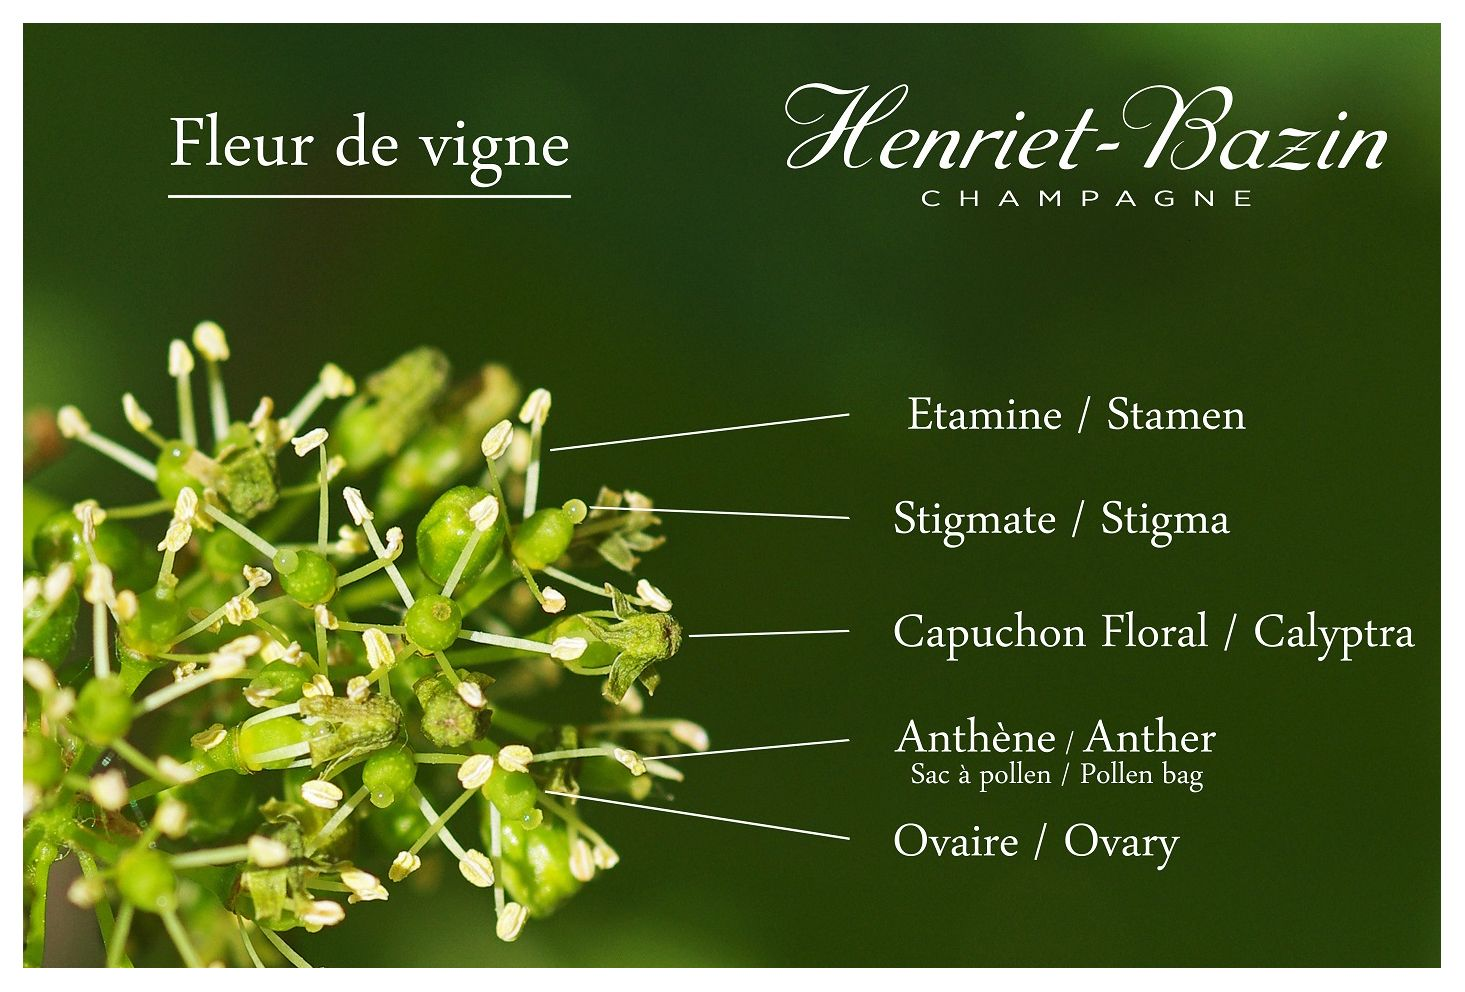 Doc Schema Fleur De Vigne Cadre Copie Spicy Bouquet Champagne